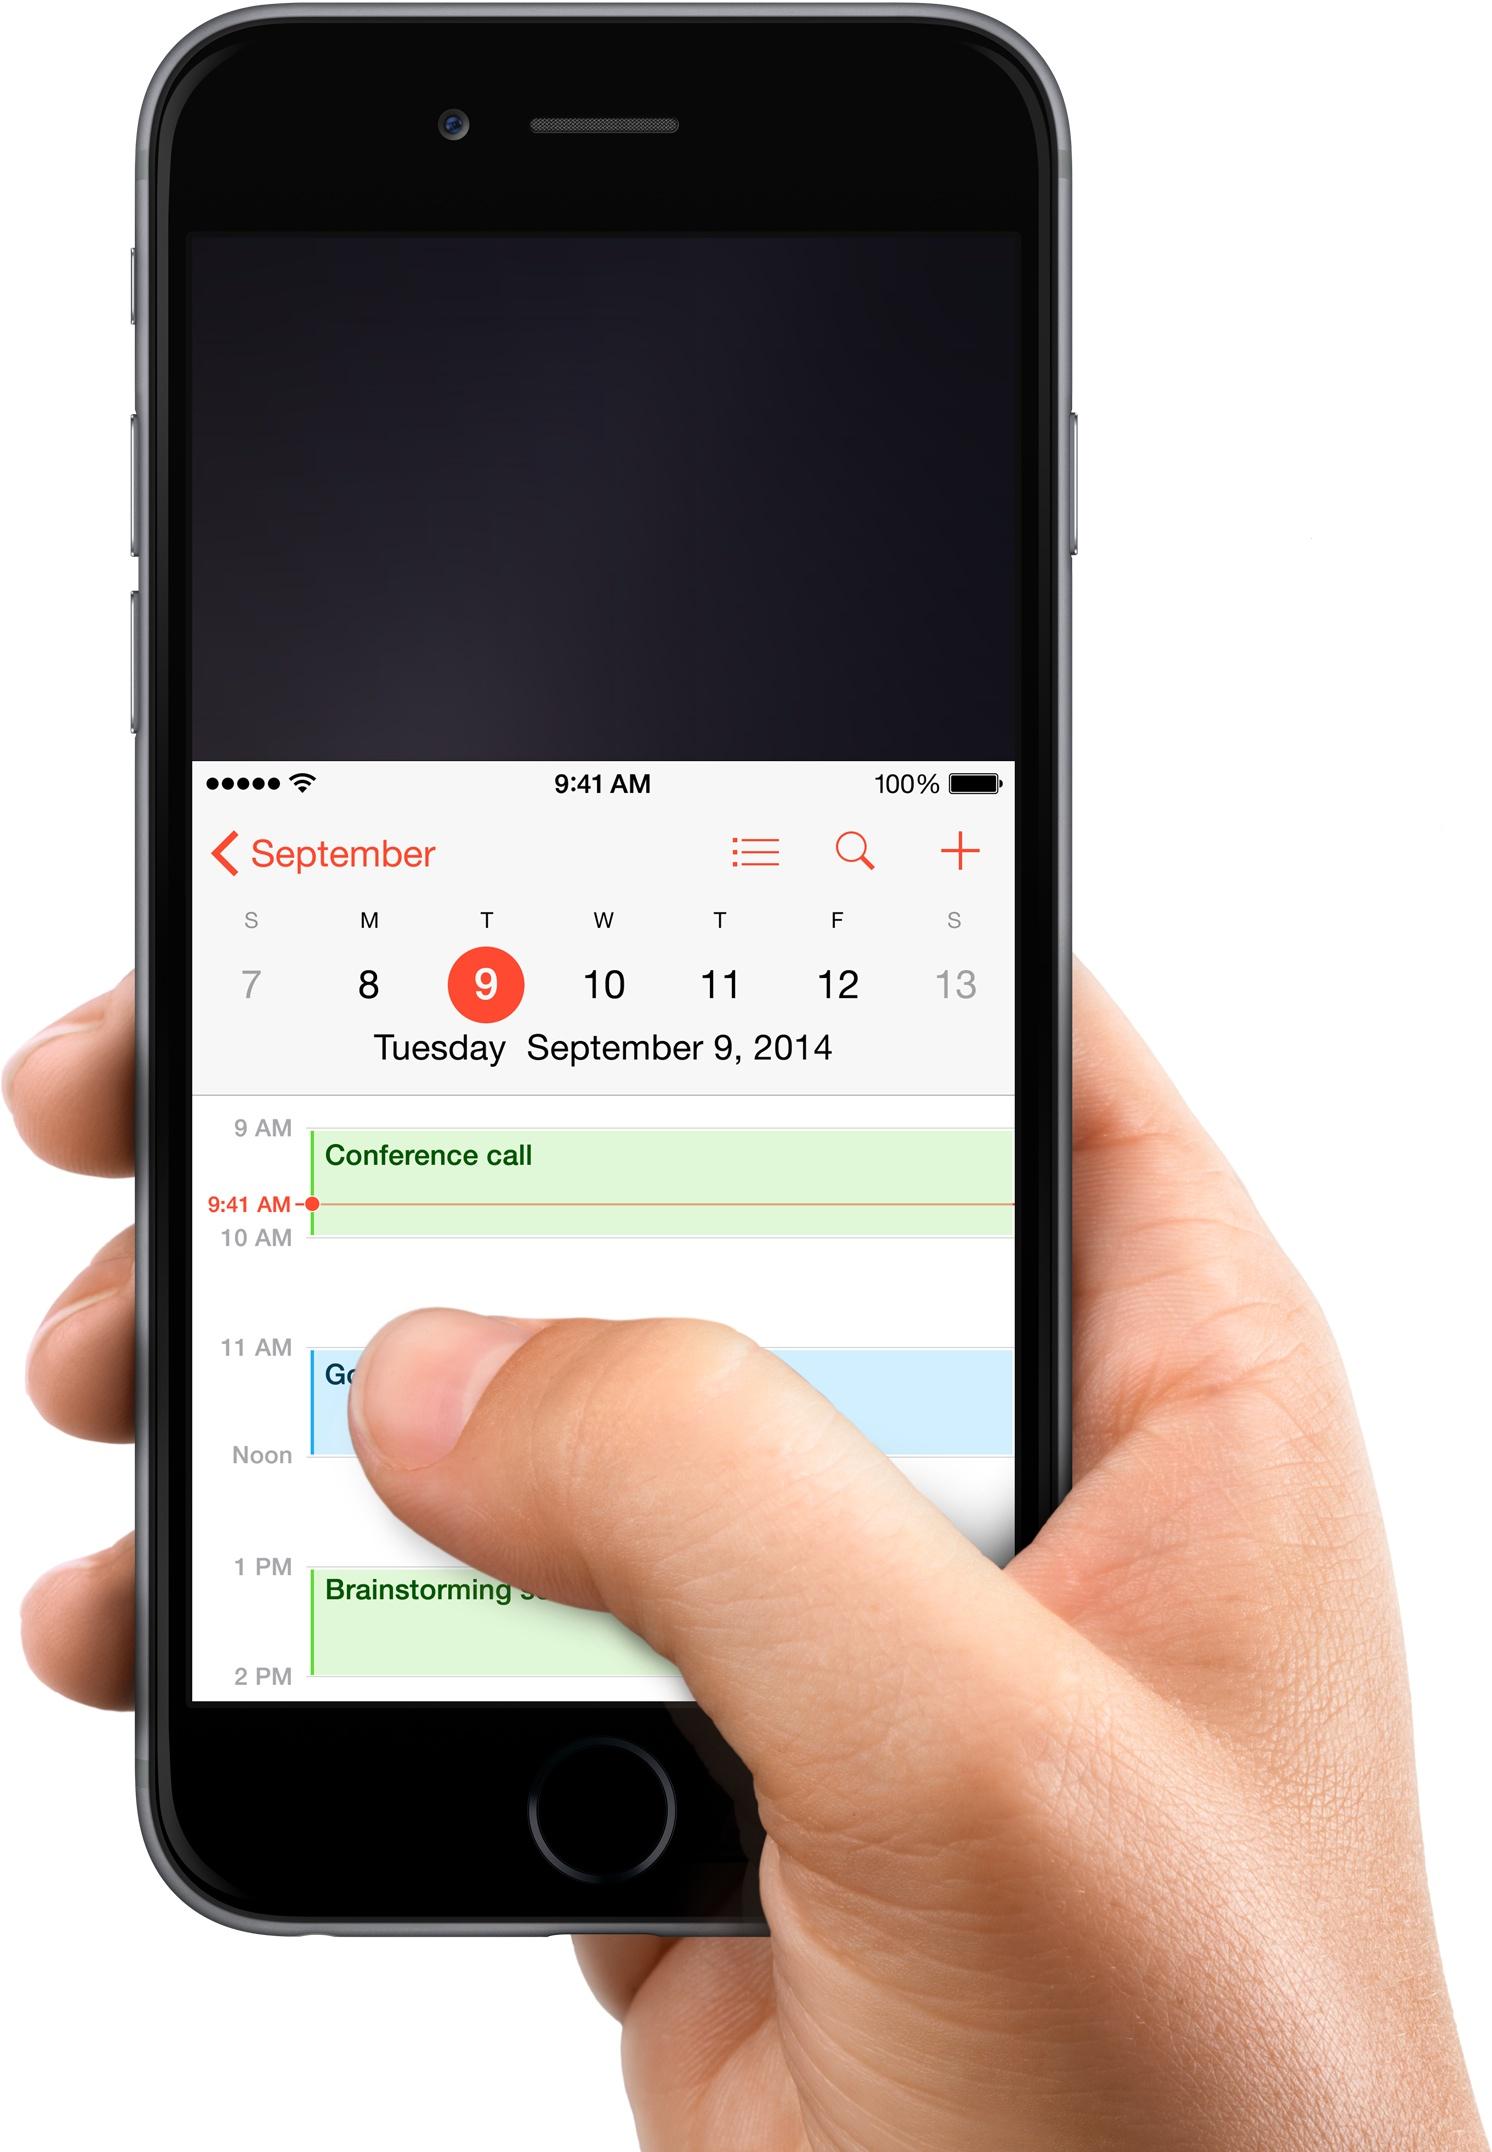 iPhone 6 Plus (Reachability 001)